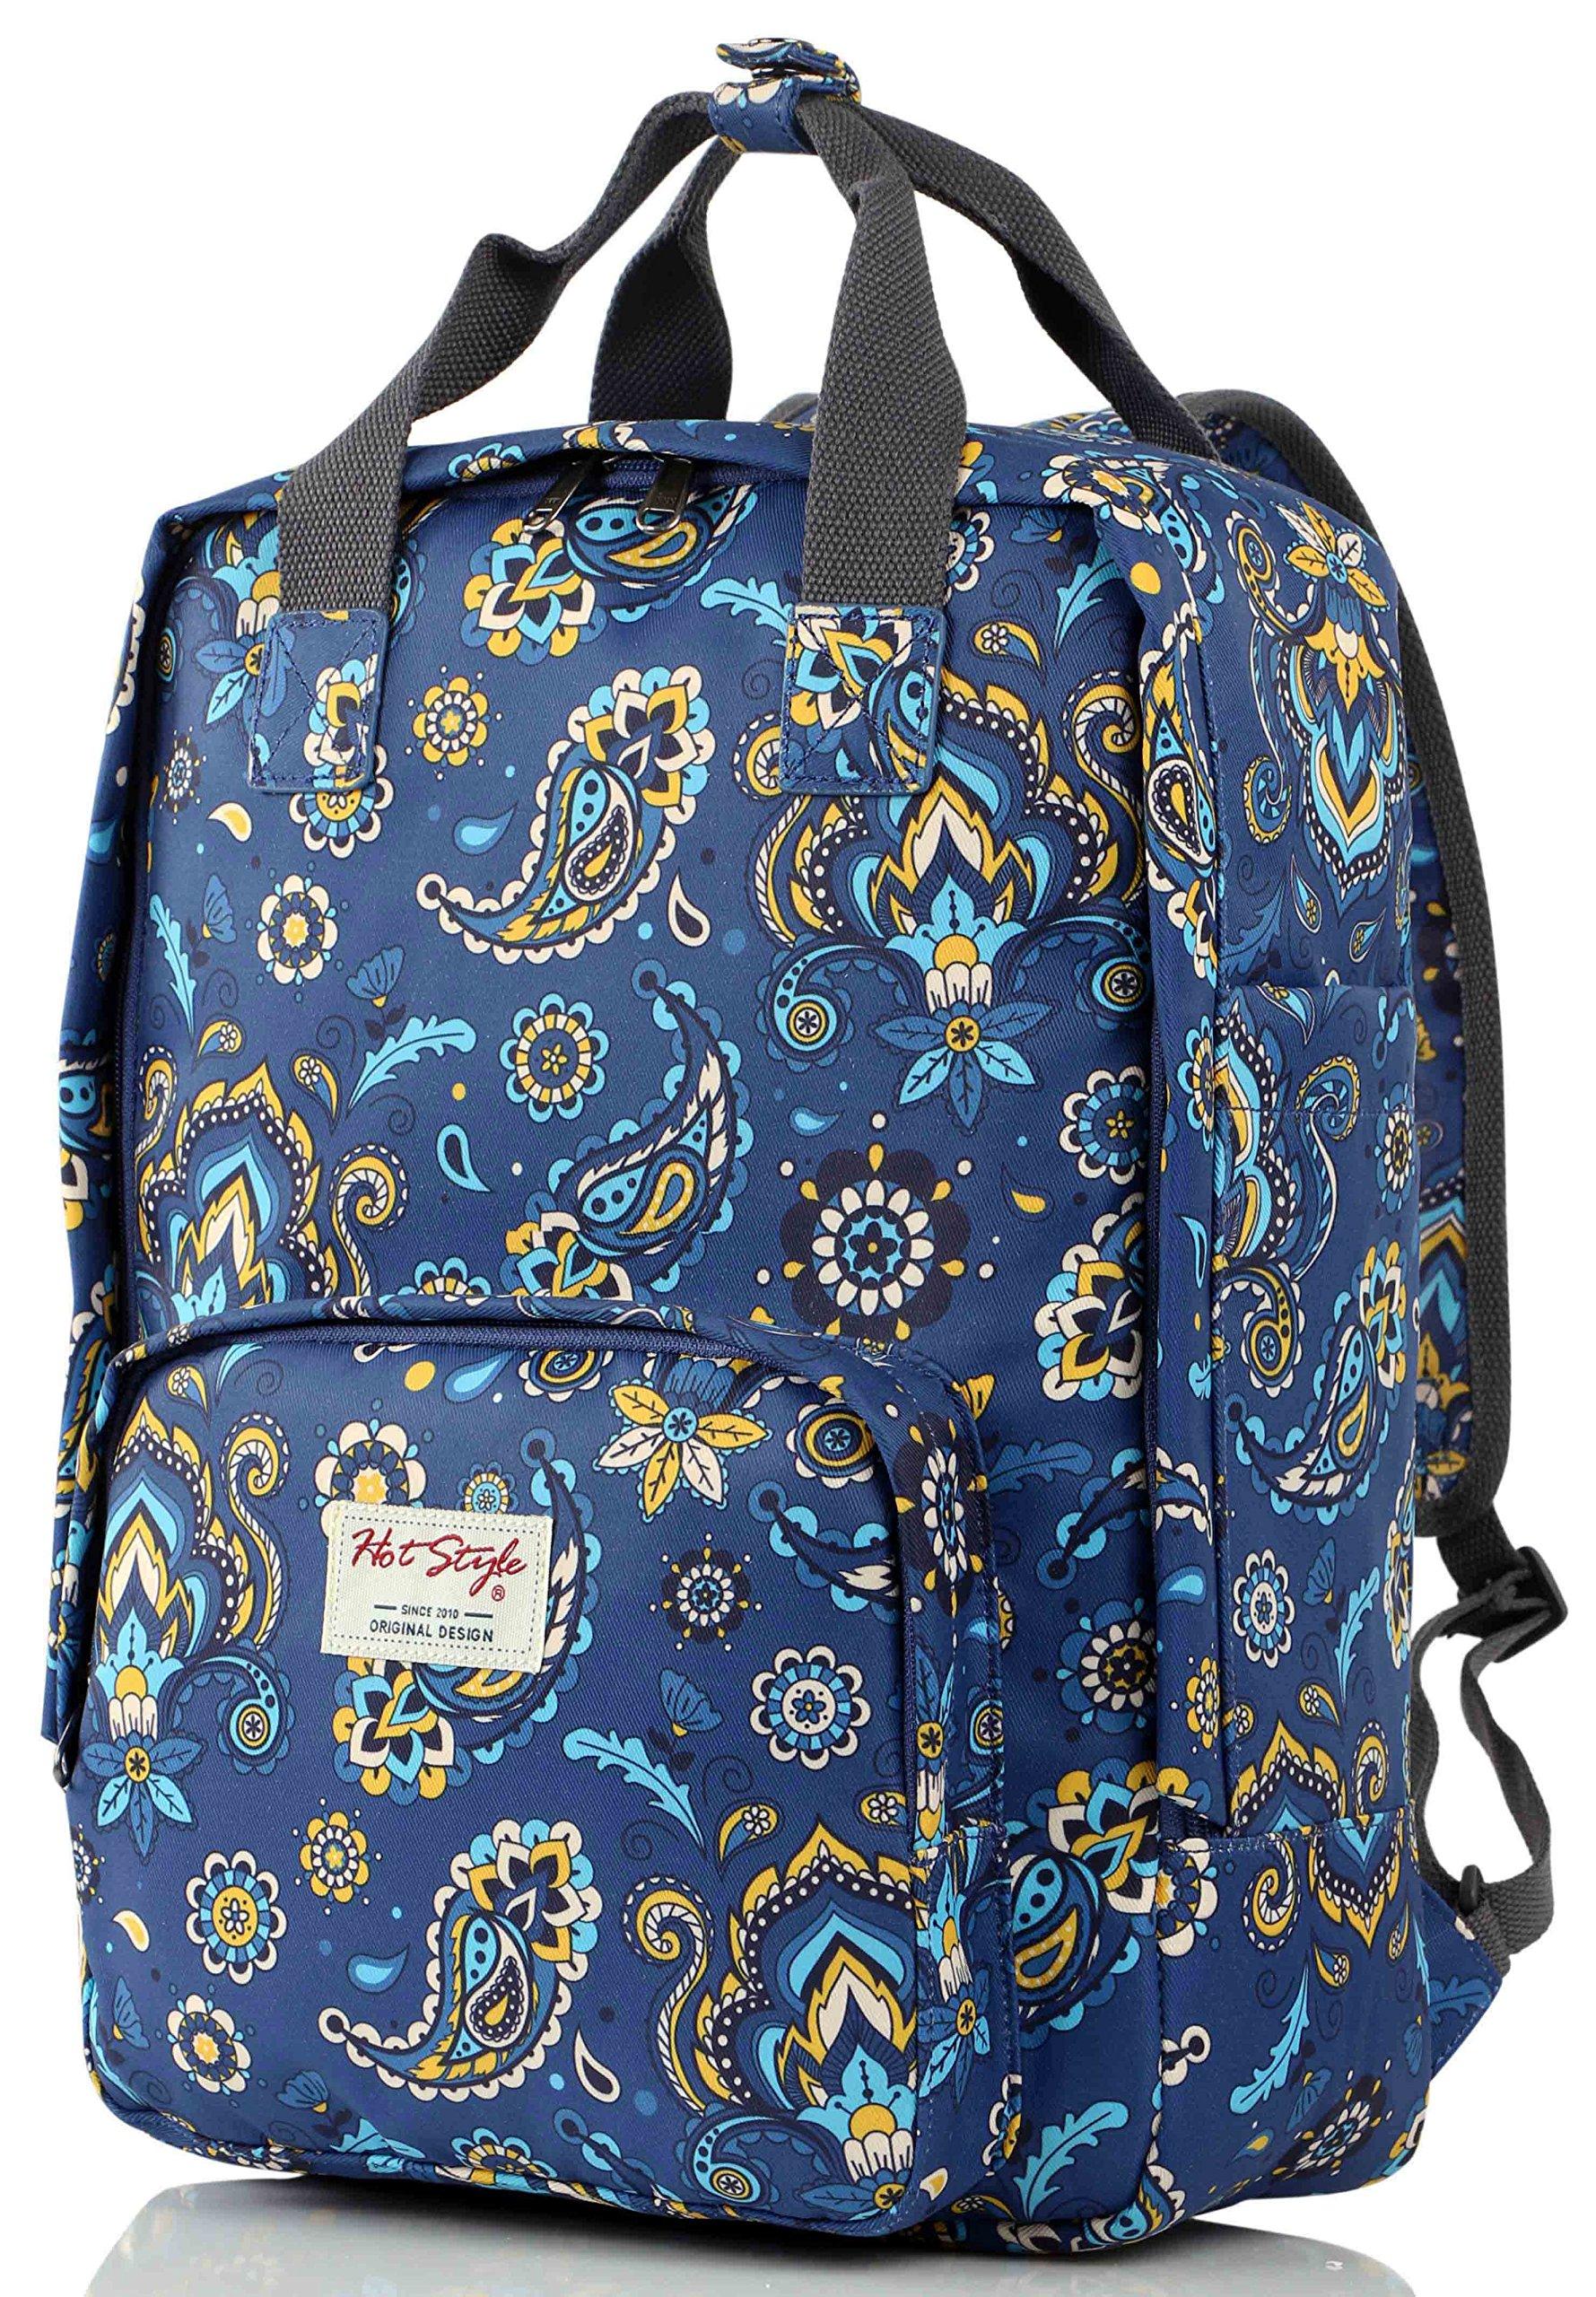 HotStyle FUNNY Women's Paisley Waterproof Backpack Diaper Bag